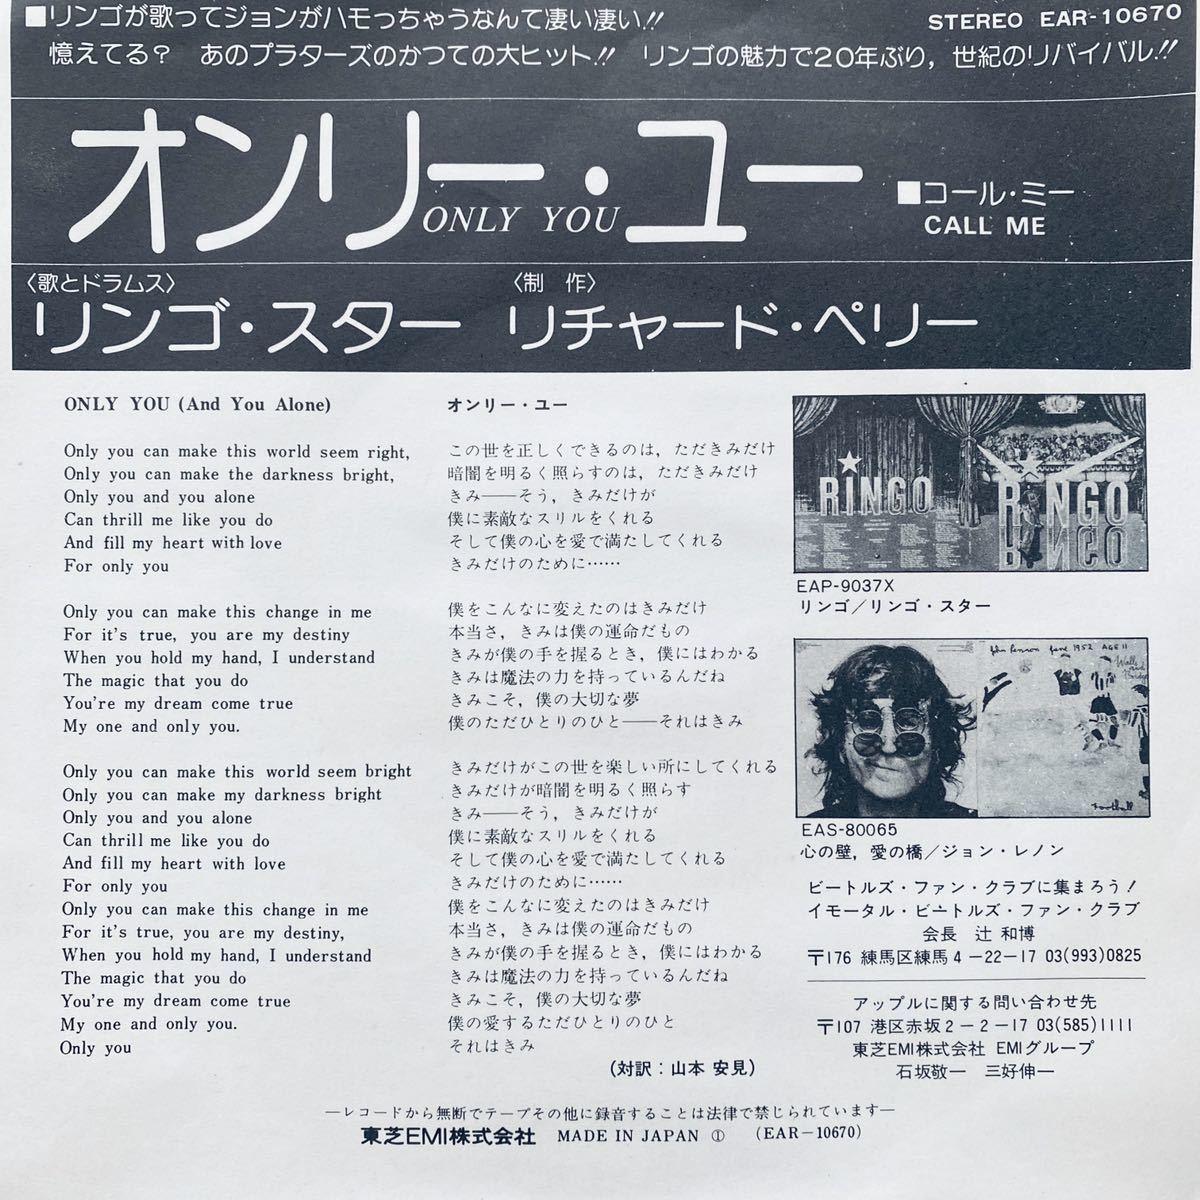 EP / リンゴ・スター - オンリー・ユー / 国内見本盤白ラベル プロモ 非売品 EAR-10670 RINGO STARR - ONLY YOU / Apple ビートルズ_画像6